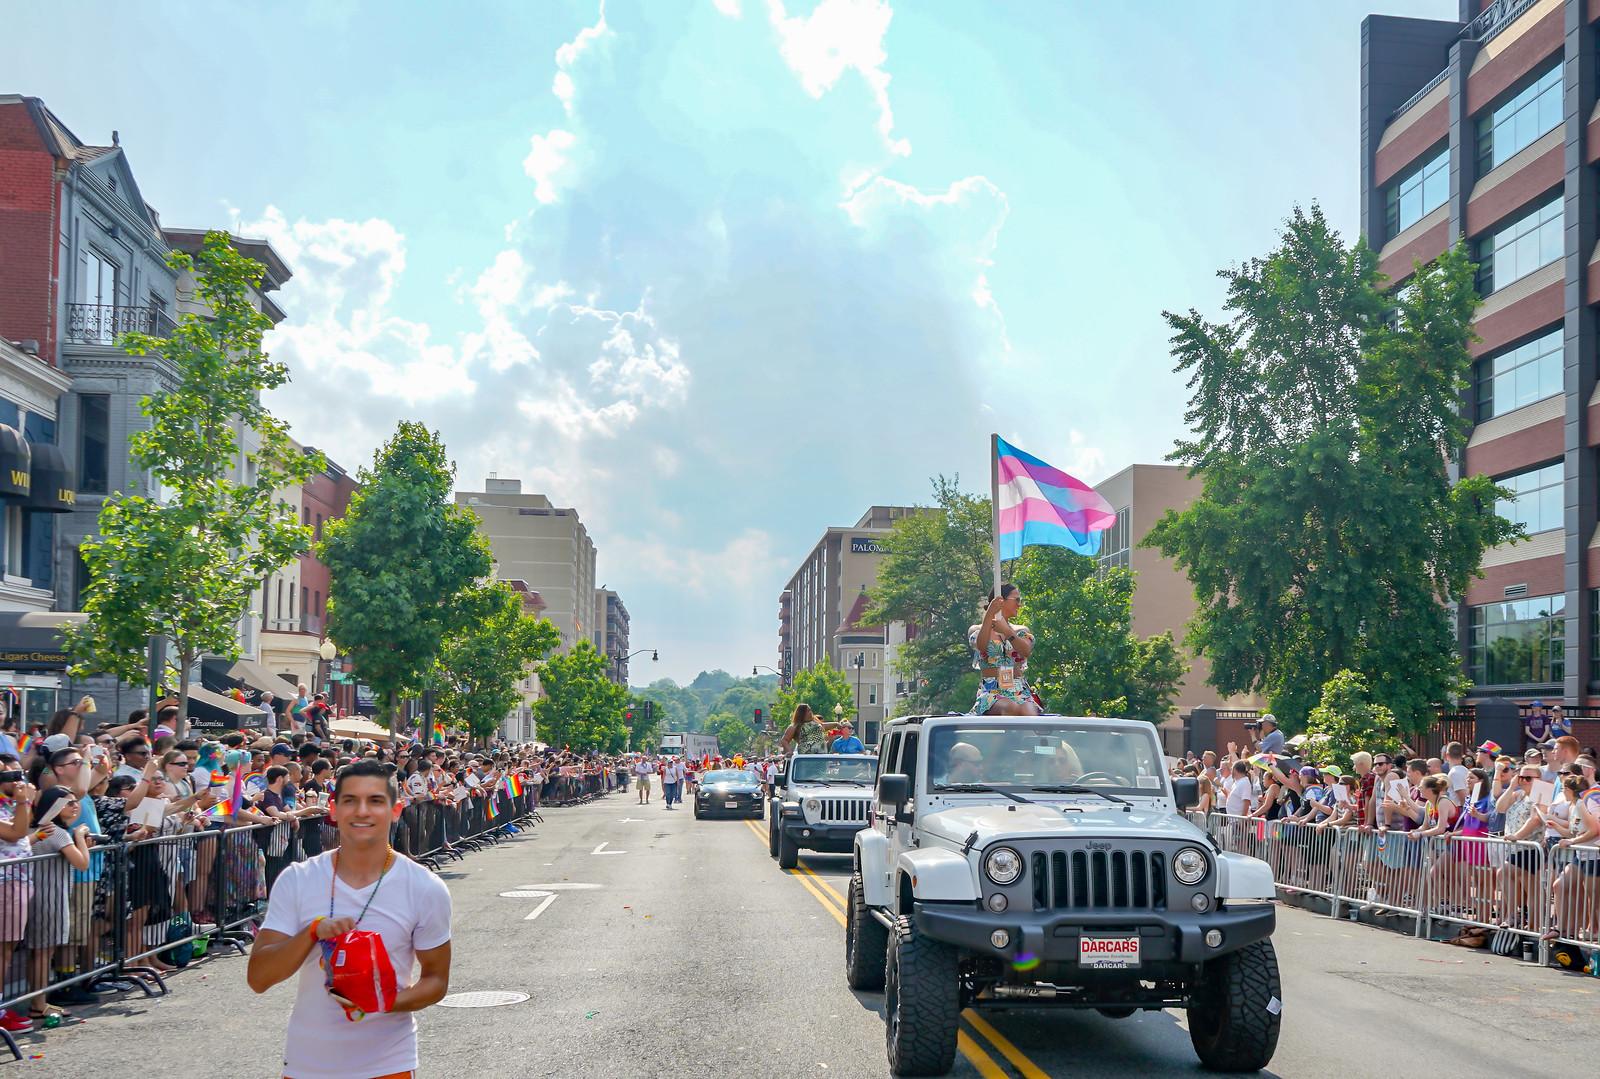 2018.06.09 Capital Pride Parade, Washington, DC USA 03108